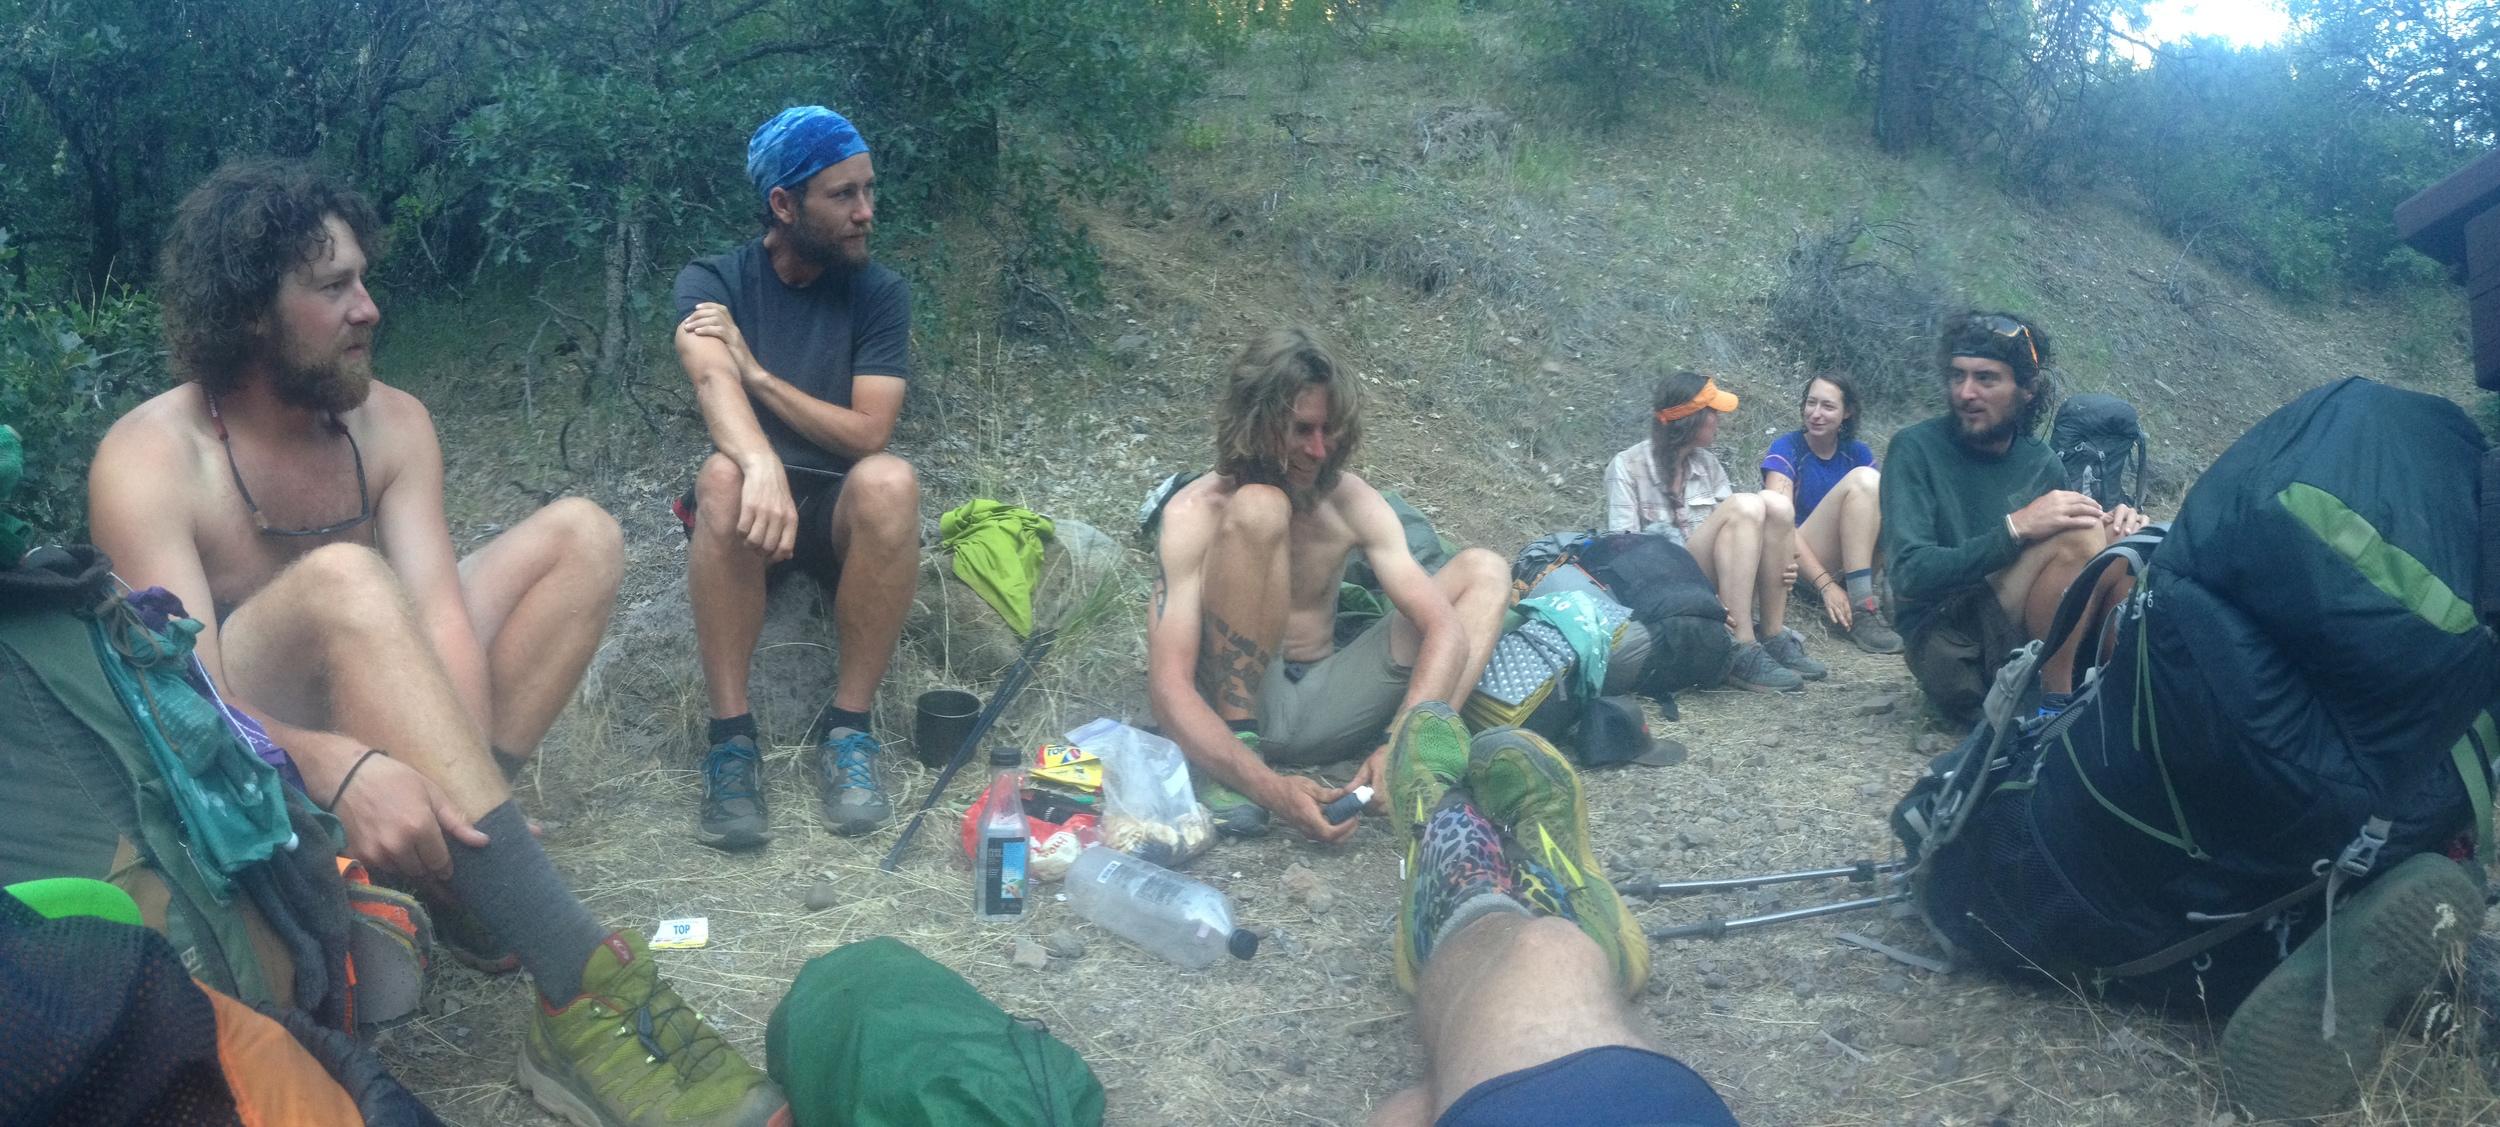 Hiker trash gathering at a watering hole.